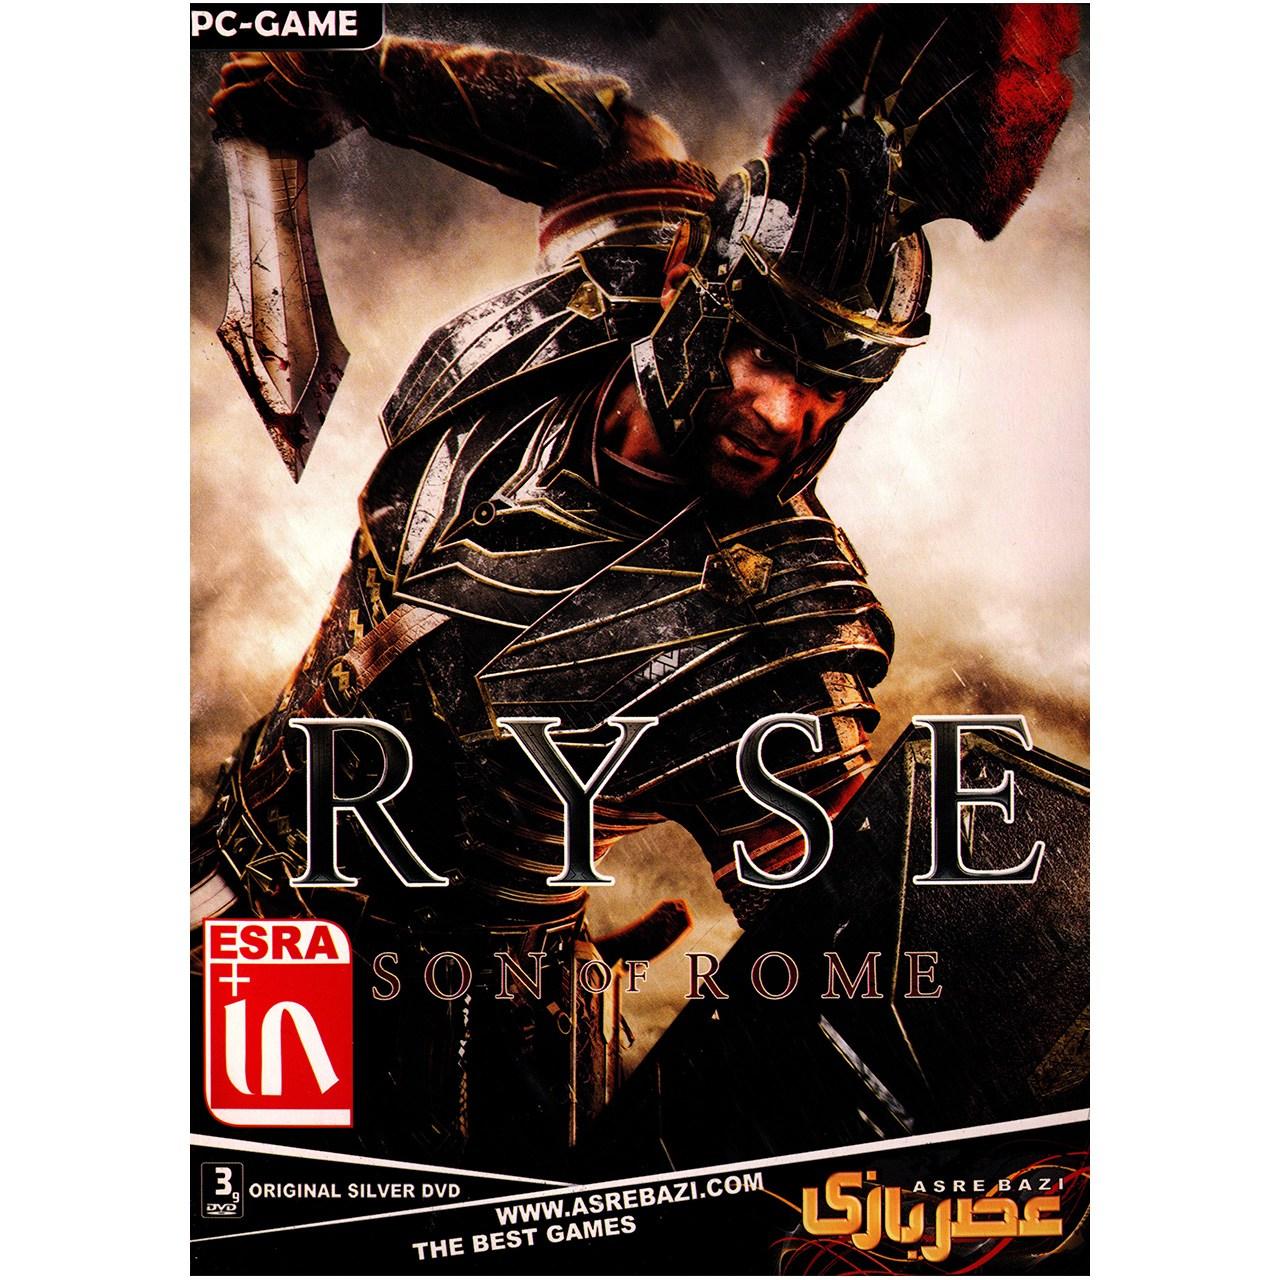 بازی کامپیوتری RYSE Son of Rome